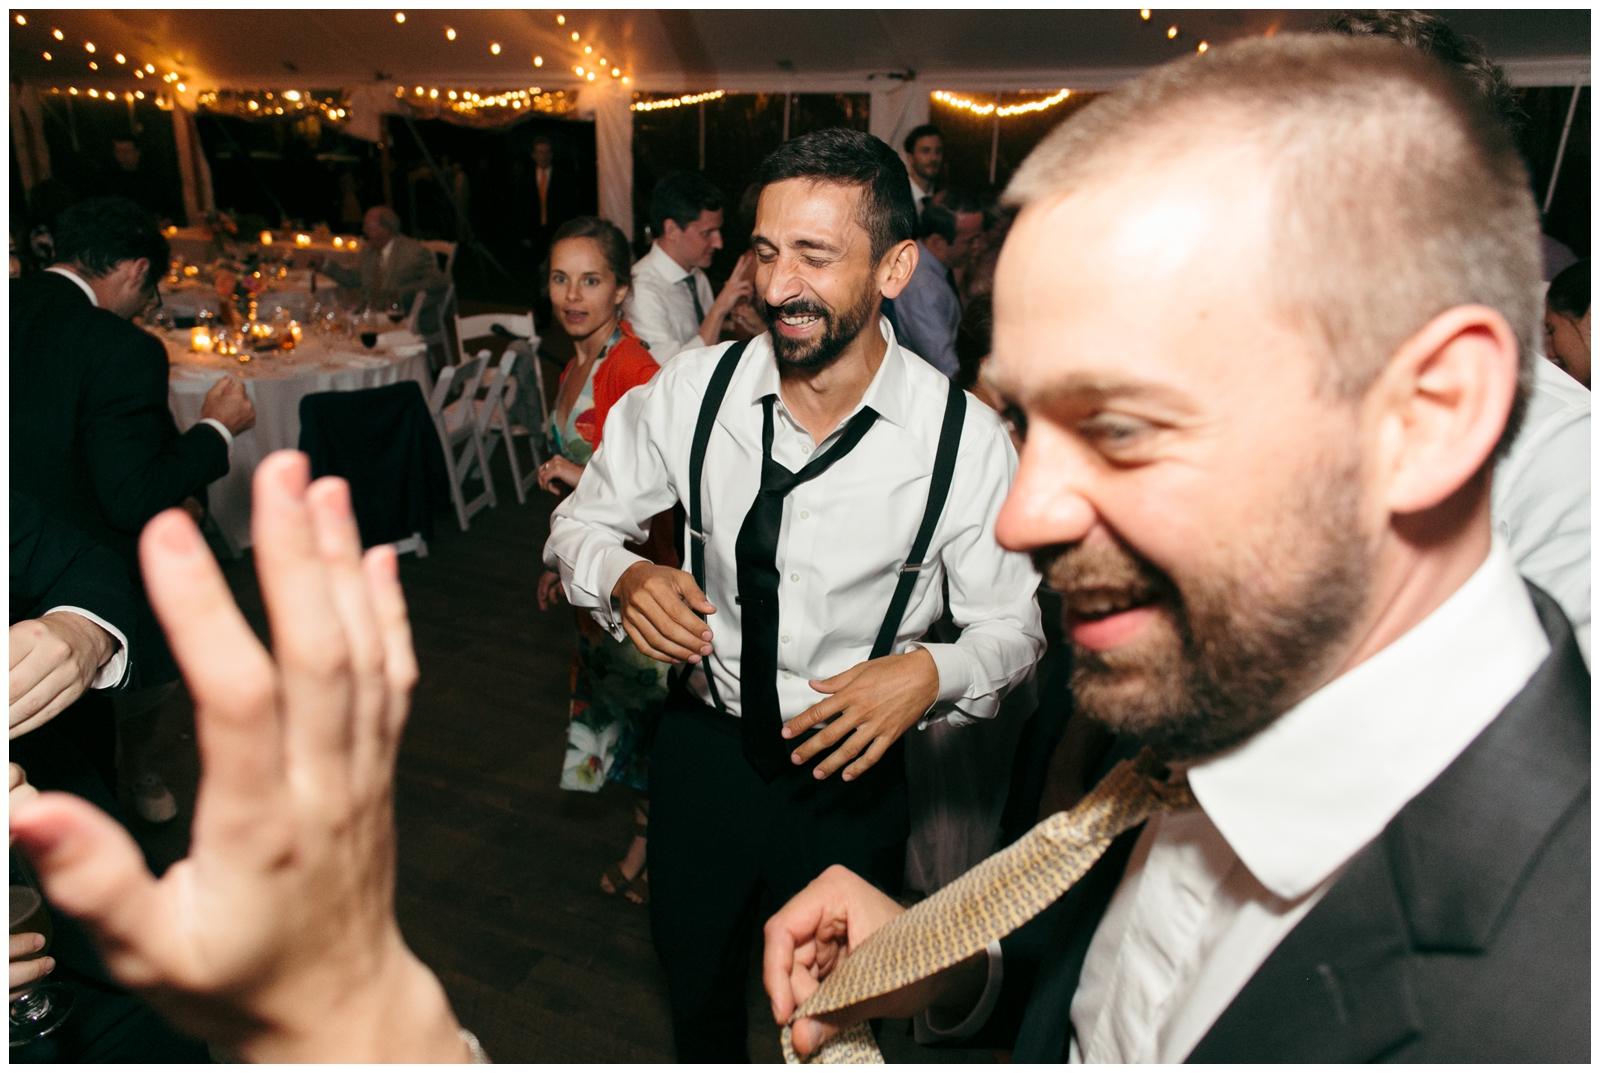 Moraine-Farm-wedding-Bailey-Q-Photo-Massachusetts-wedding-photpgrapher-151.jpg